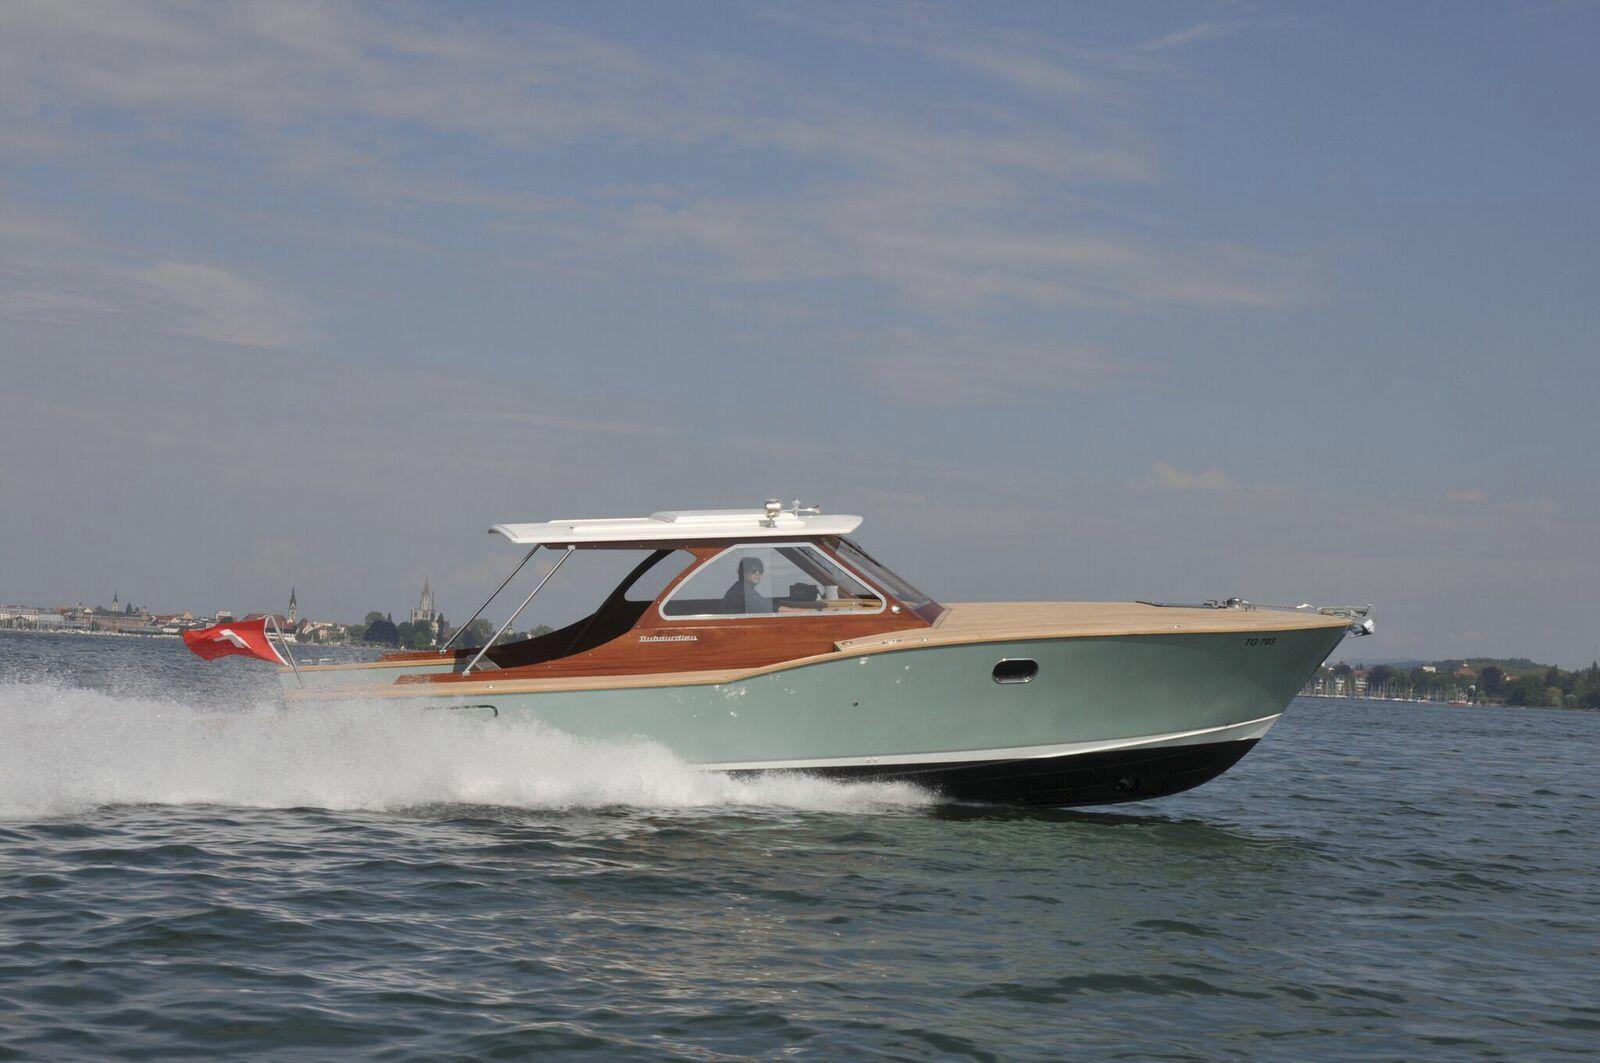 Inboard express cruiser / hard-top / sport / wooden - PICNIC CABIN